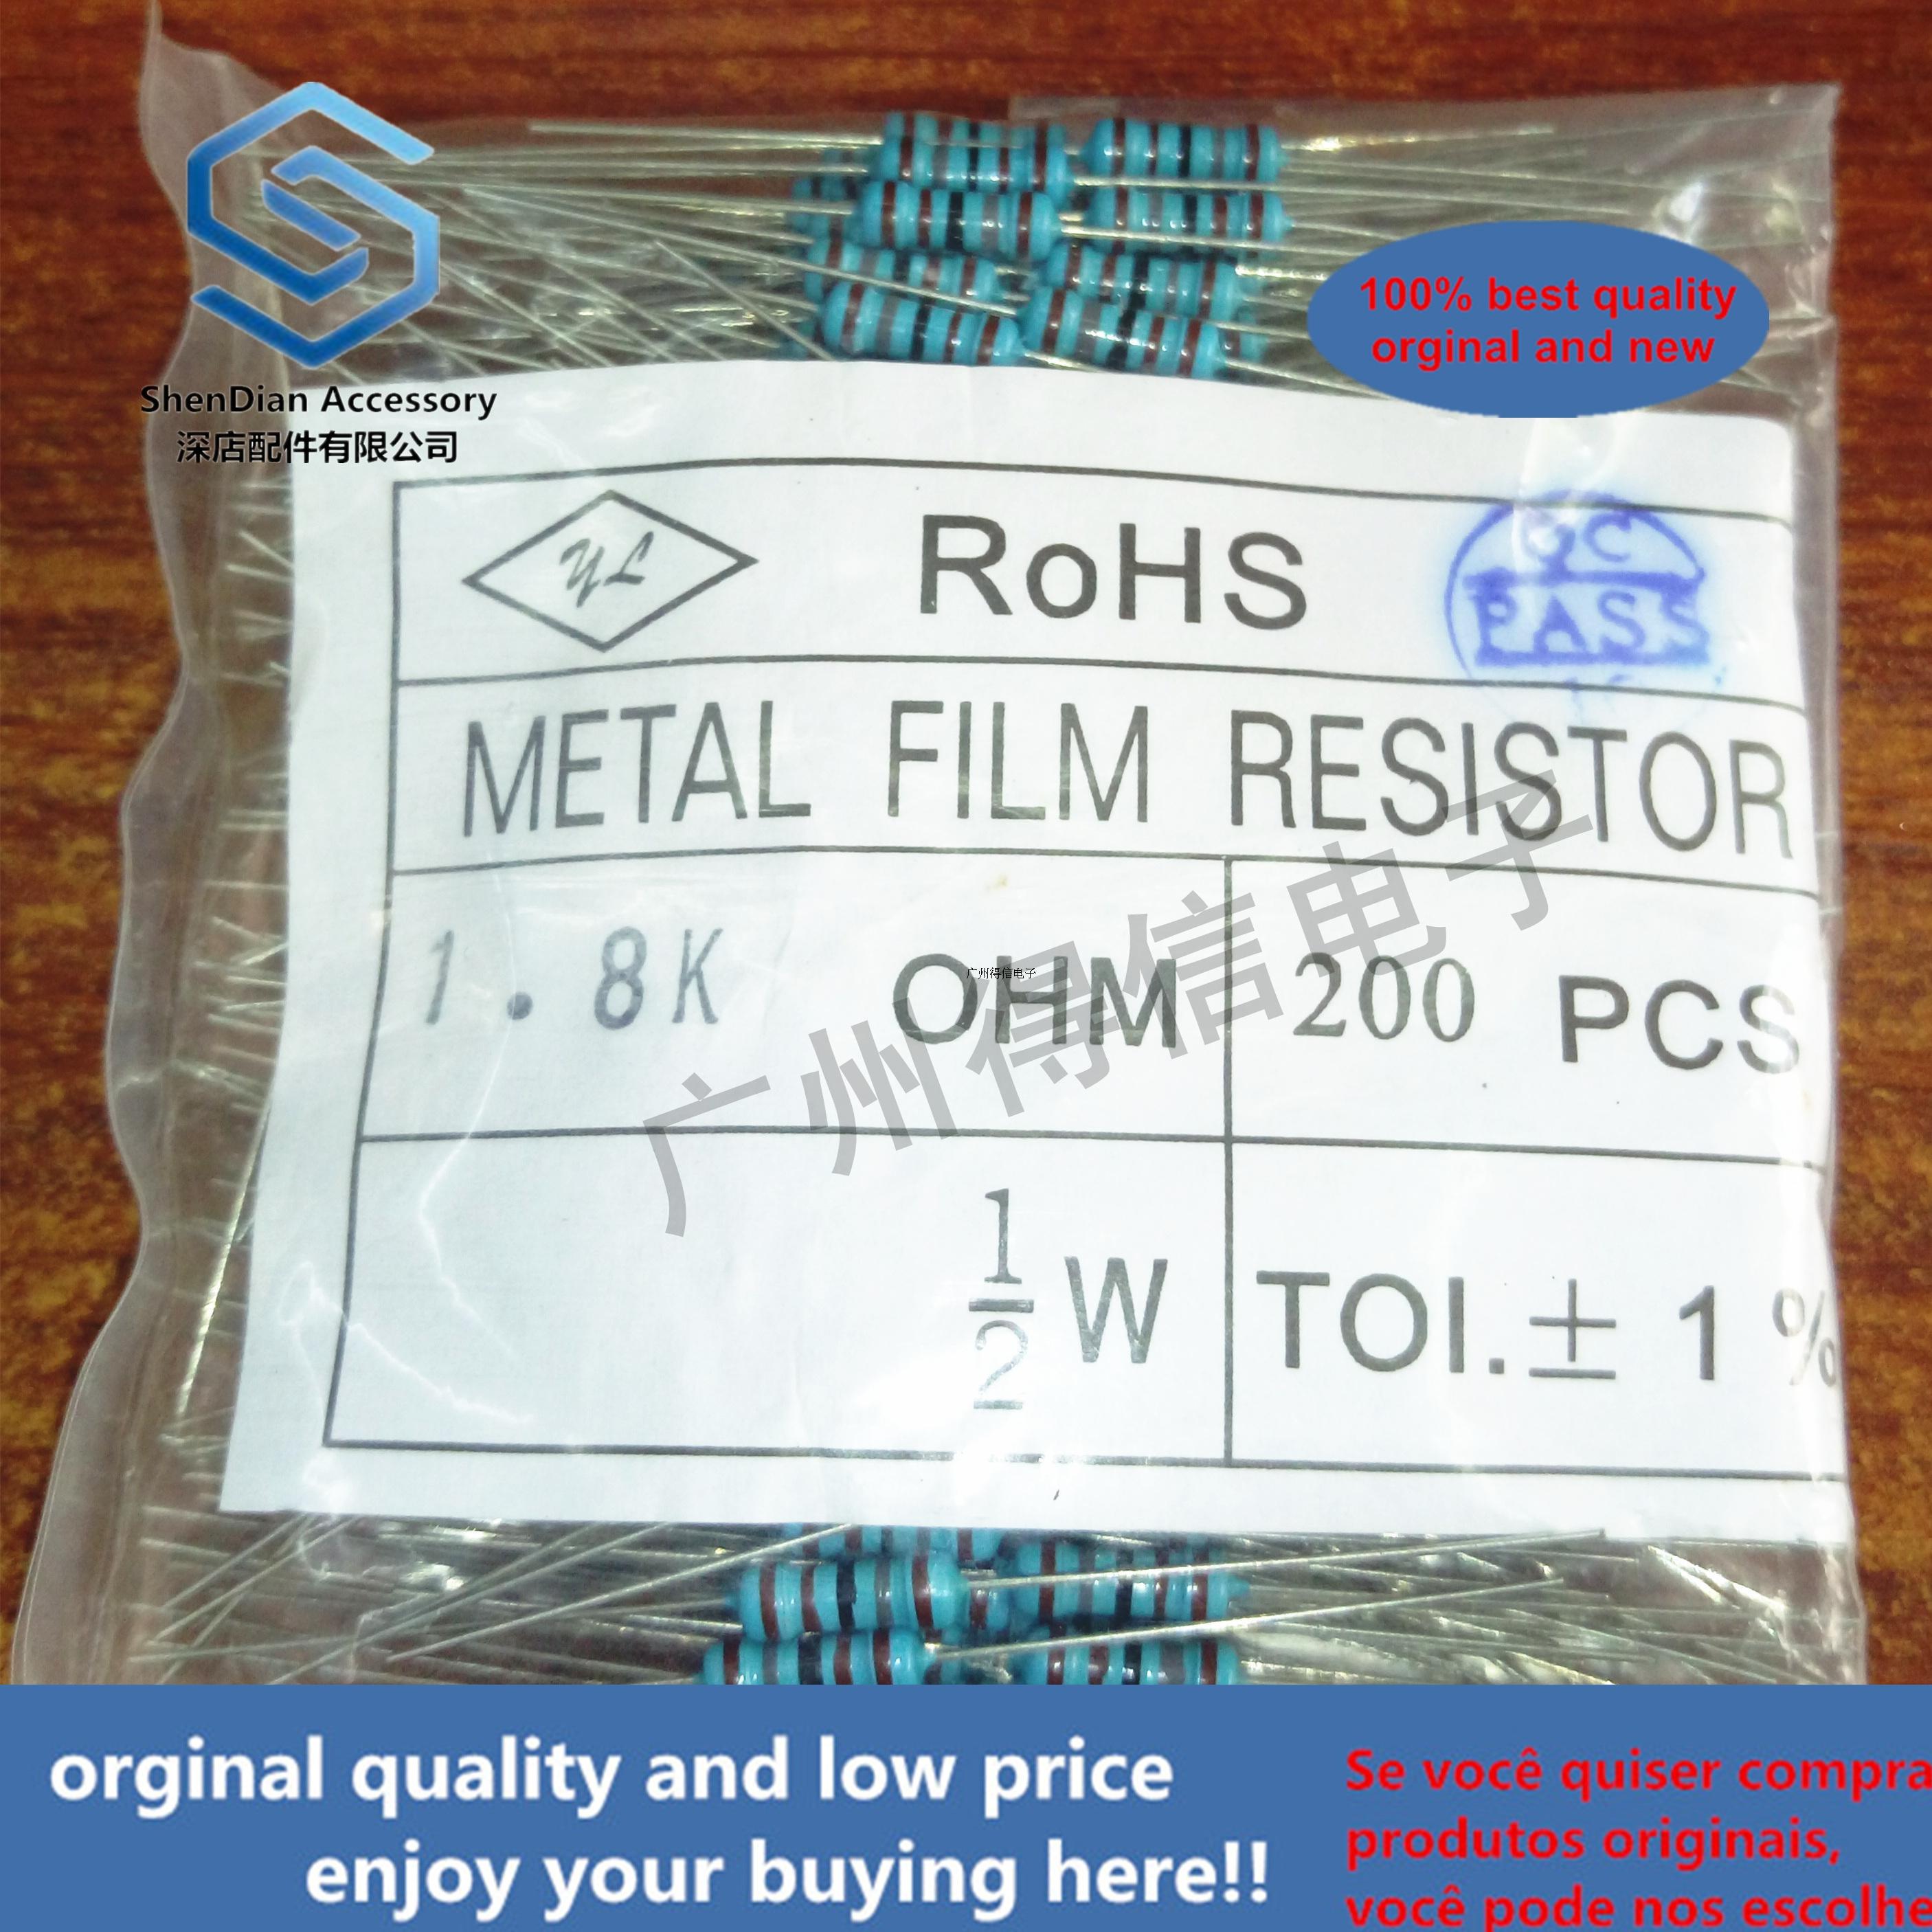 200pcs 1 / 2W 82K 1% Brand New Metal Film Iron Feet Resistance Bag 200 Pcs Per Pack